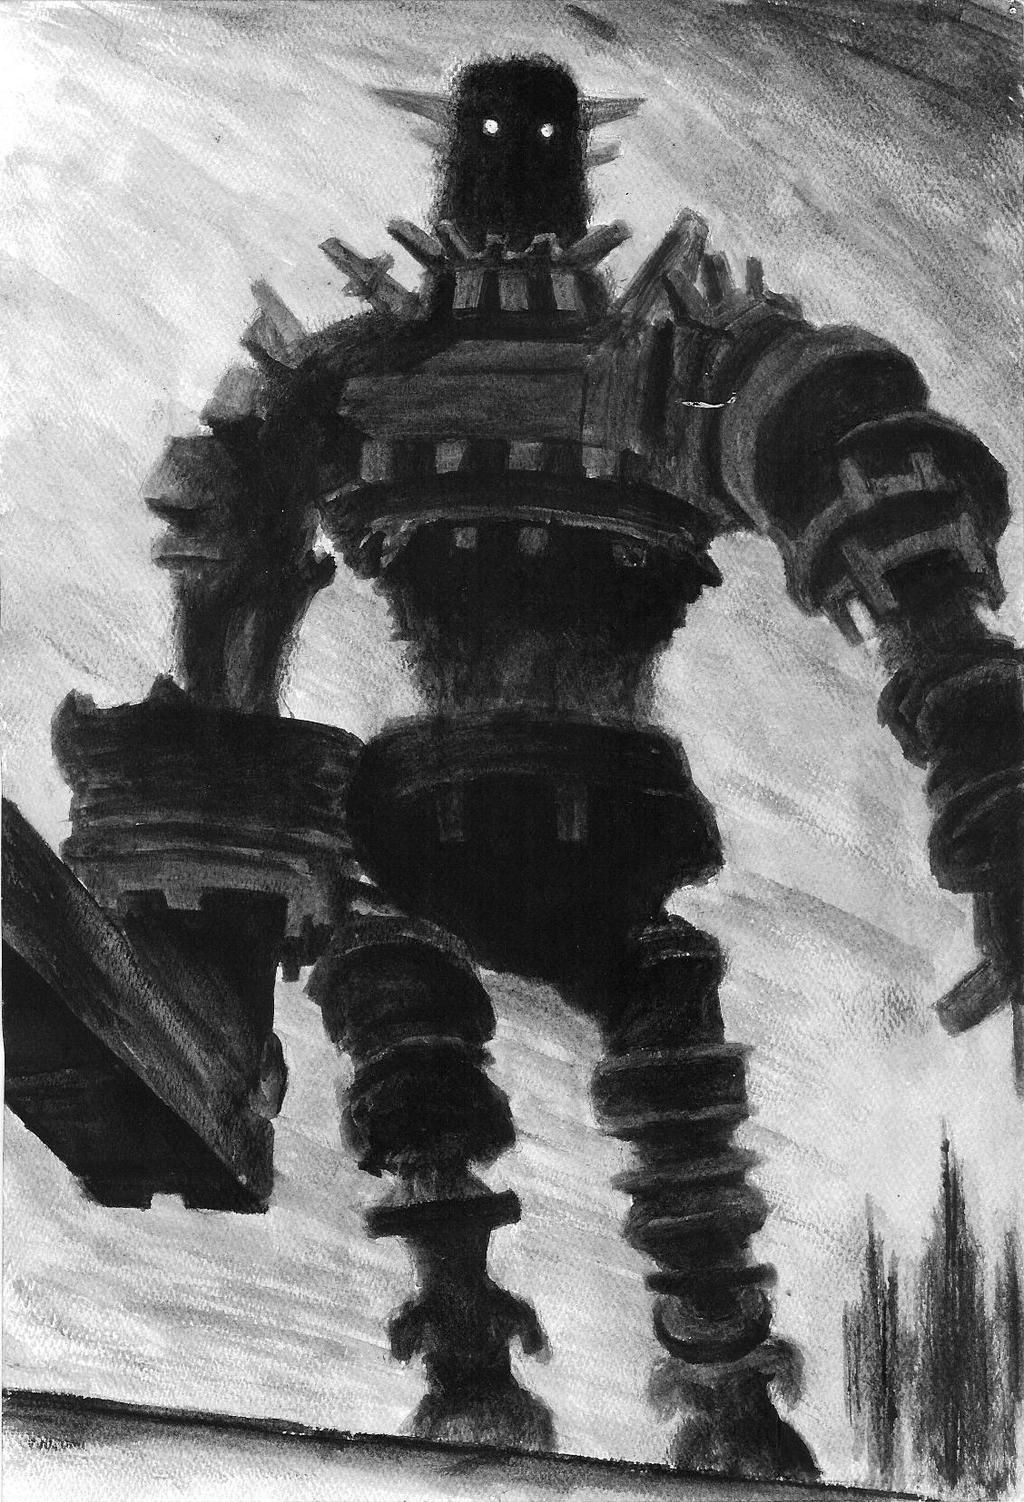 3rd Colossus: Gaius by Nikman1010 on DeviantArt